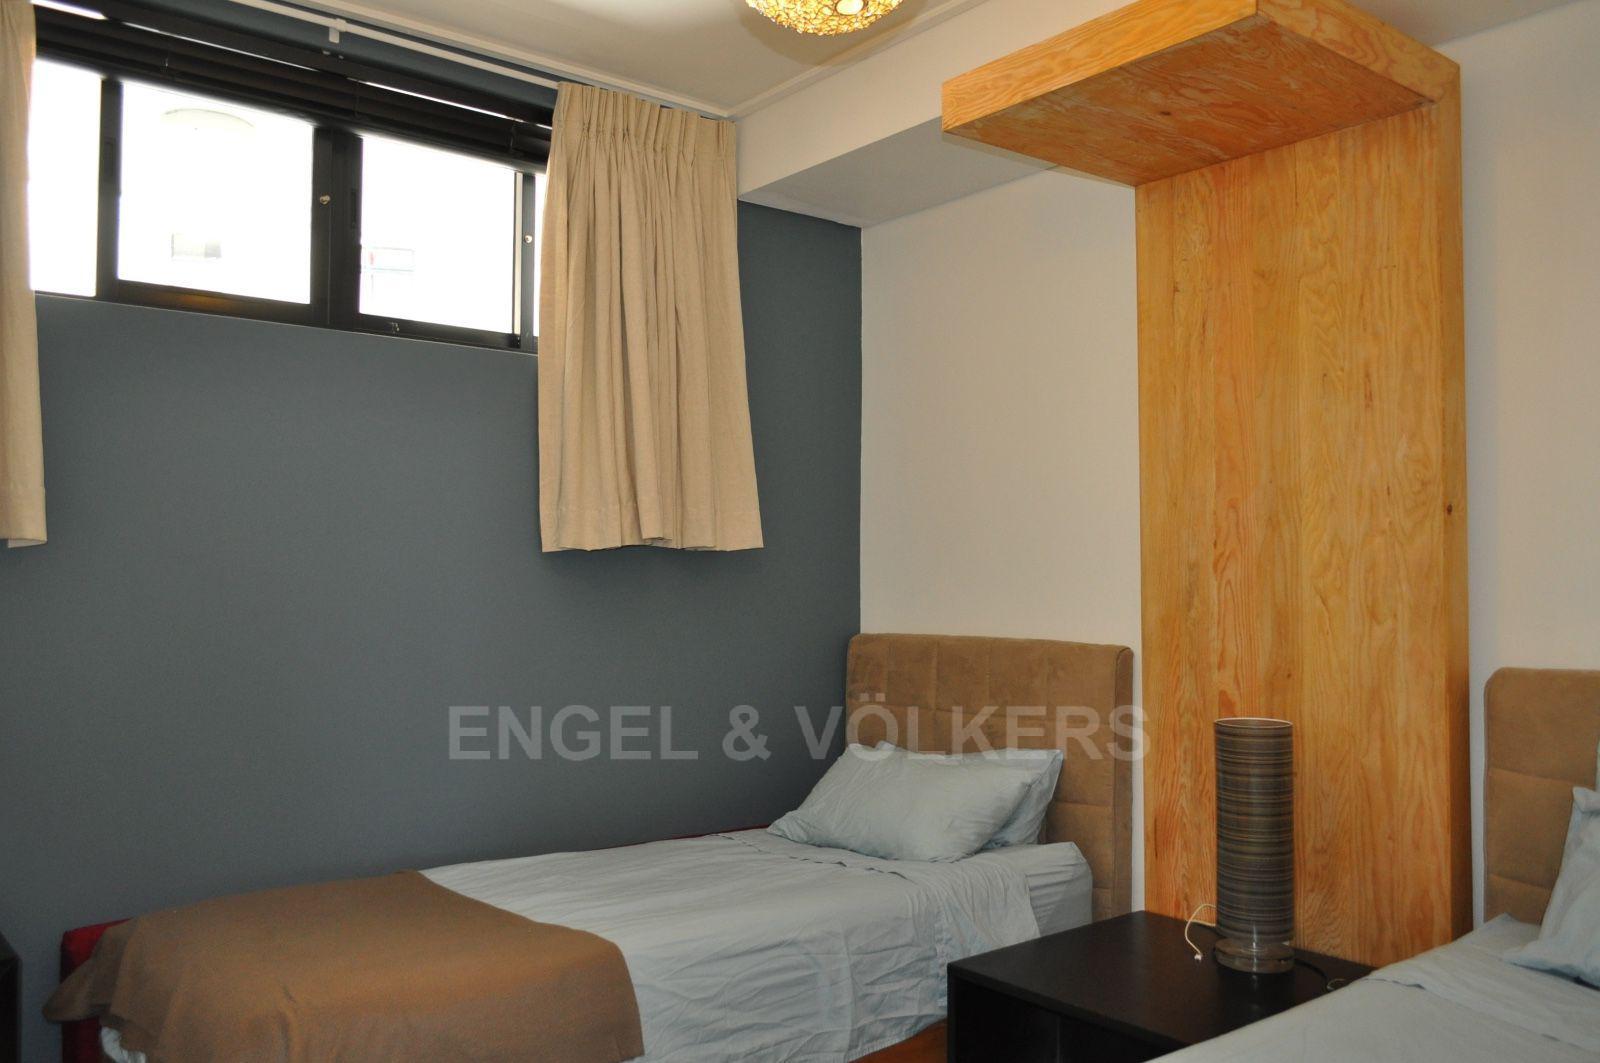 De Waterkant property for sale. Ref No: 13450081. Picture no 11